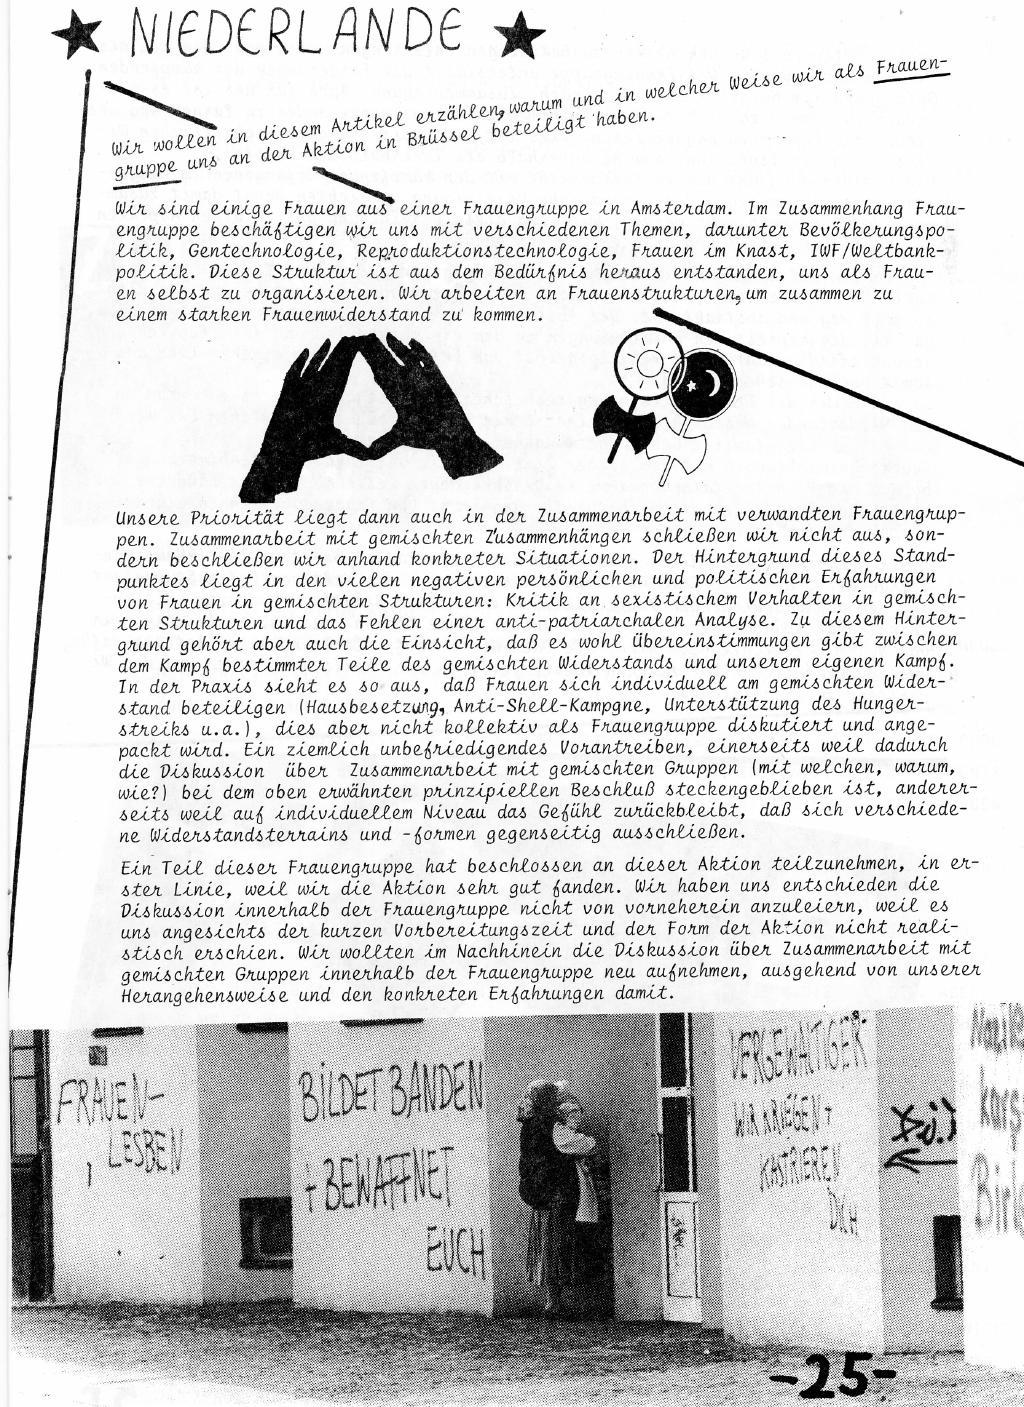 Belgien_Doku_Besetzung_EG_Kommission_1989_027